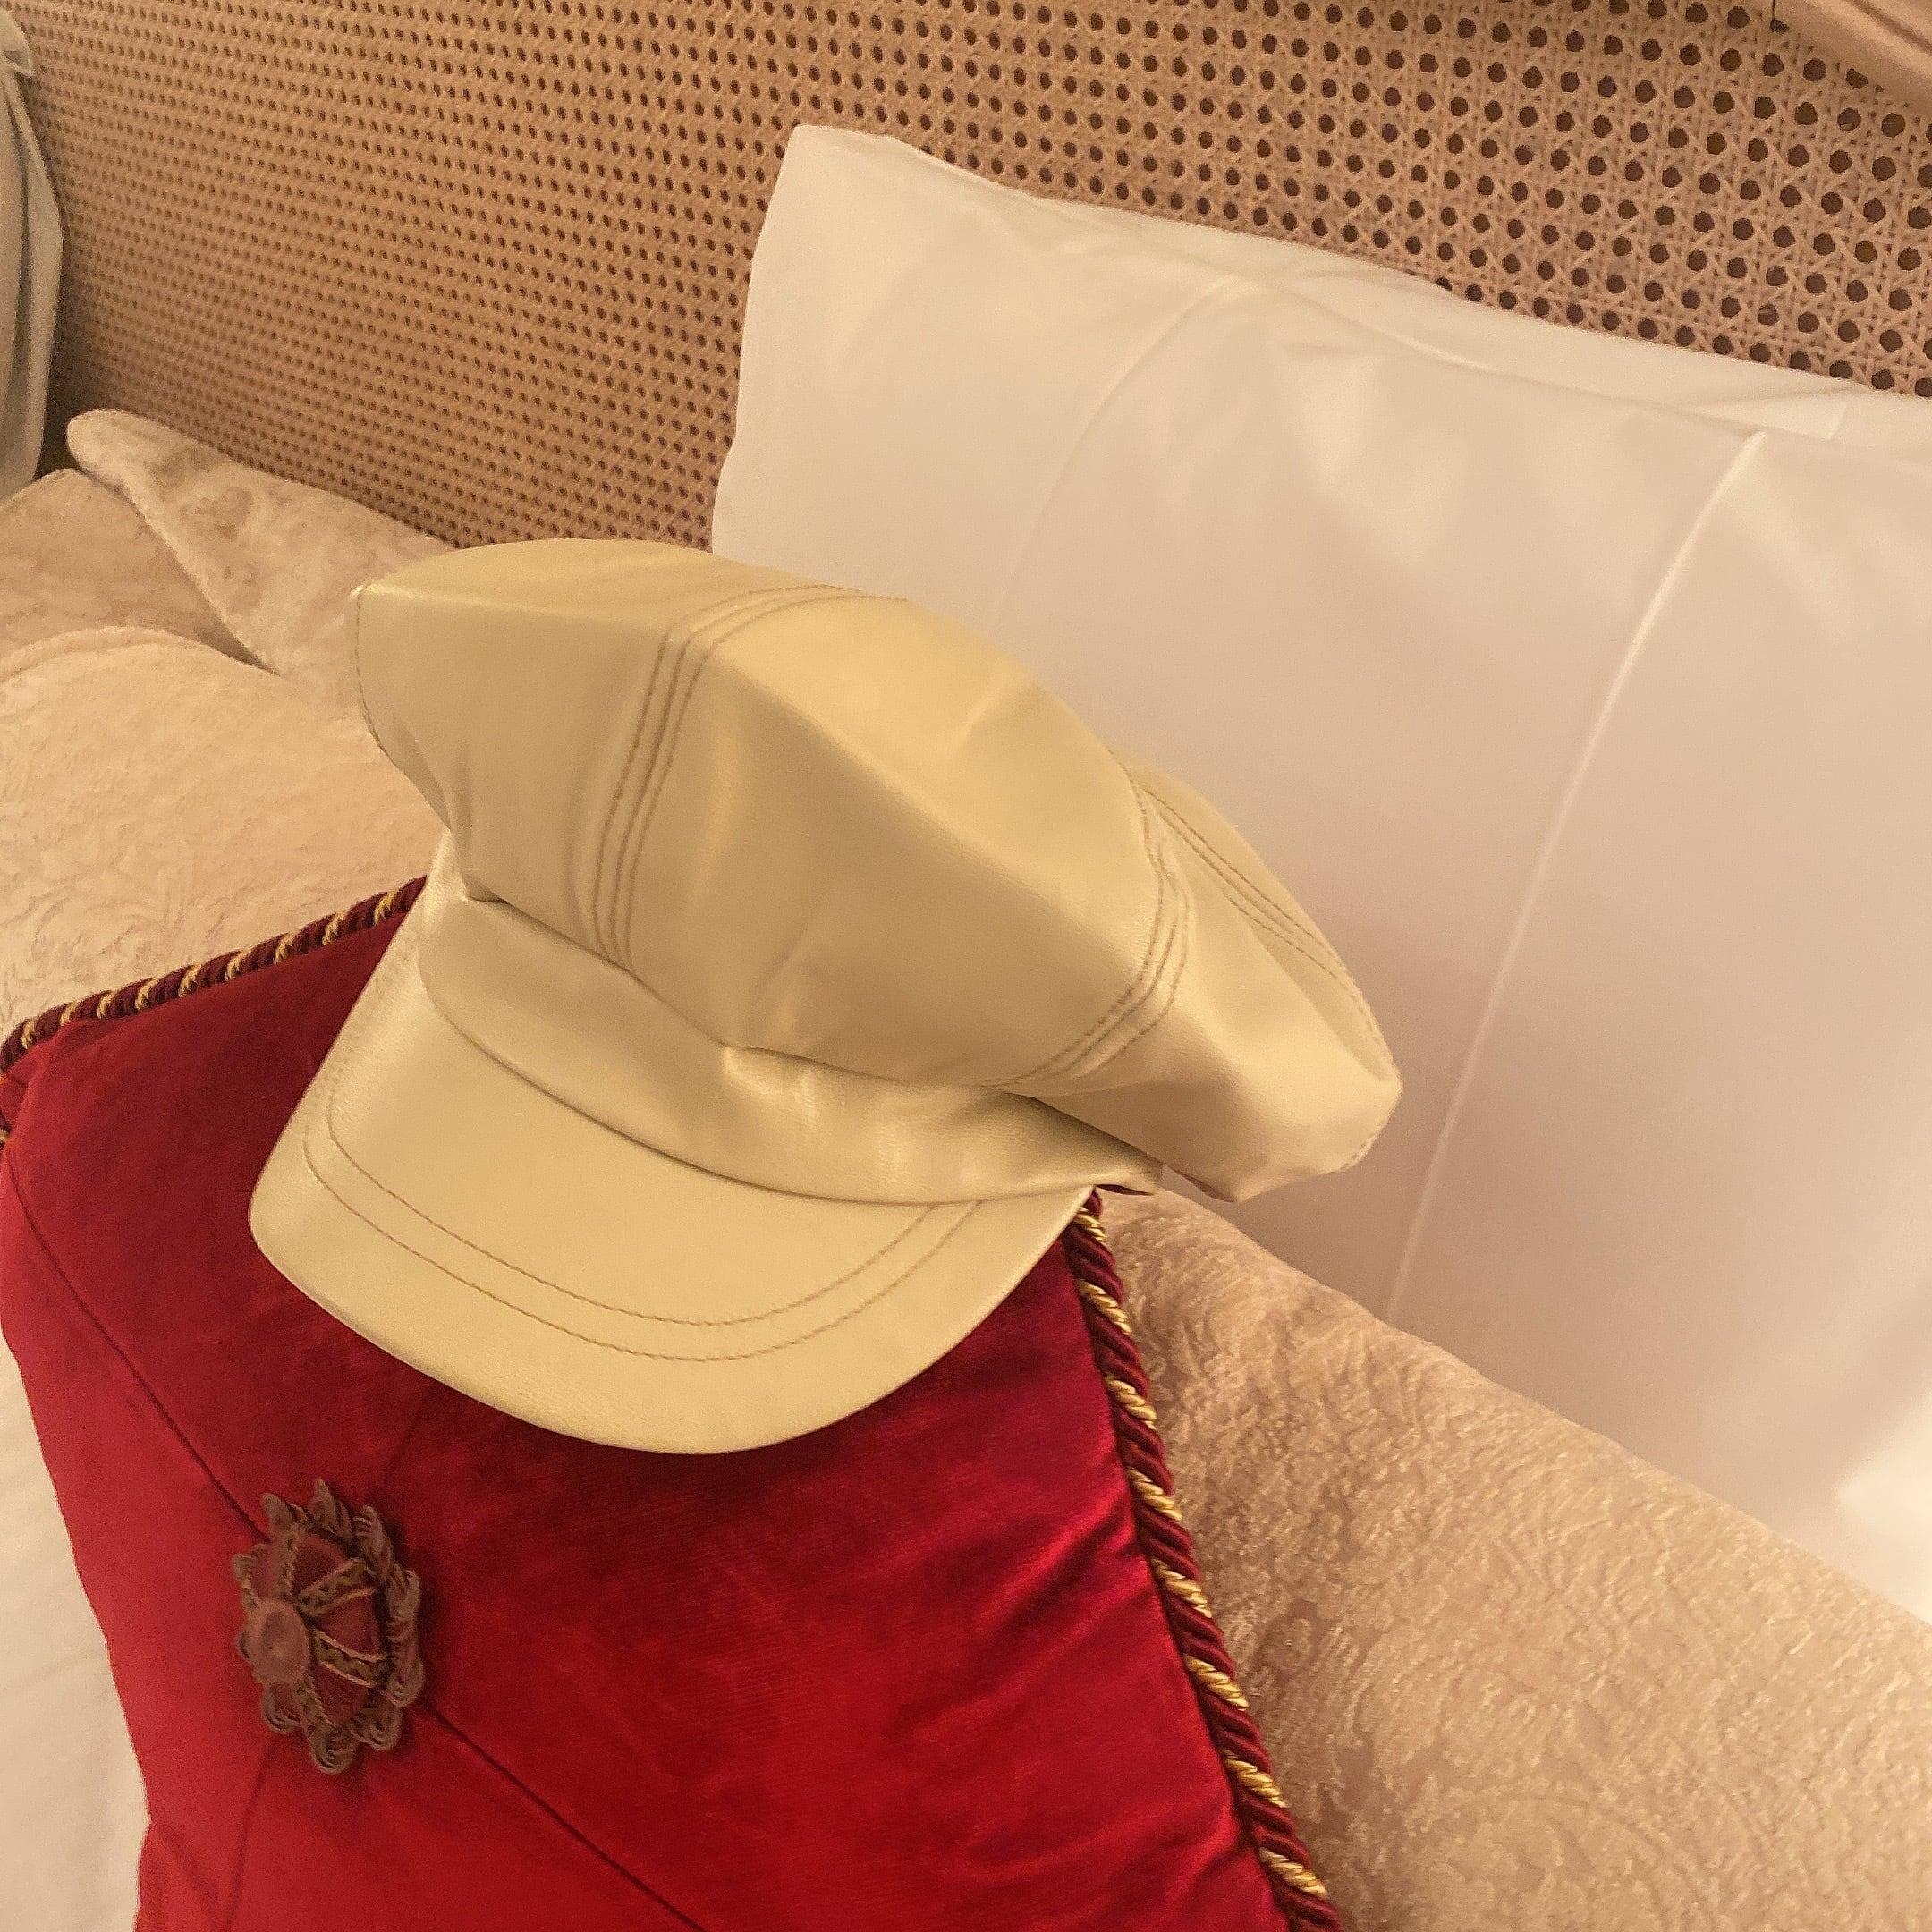 fake leather casquette